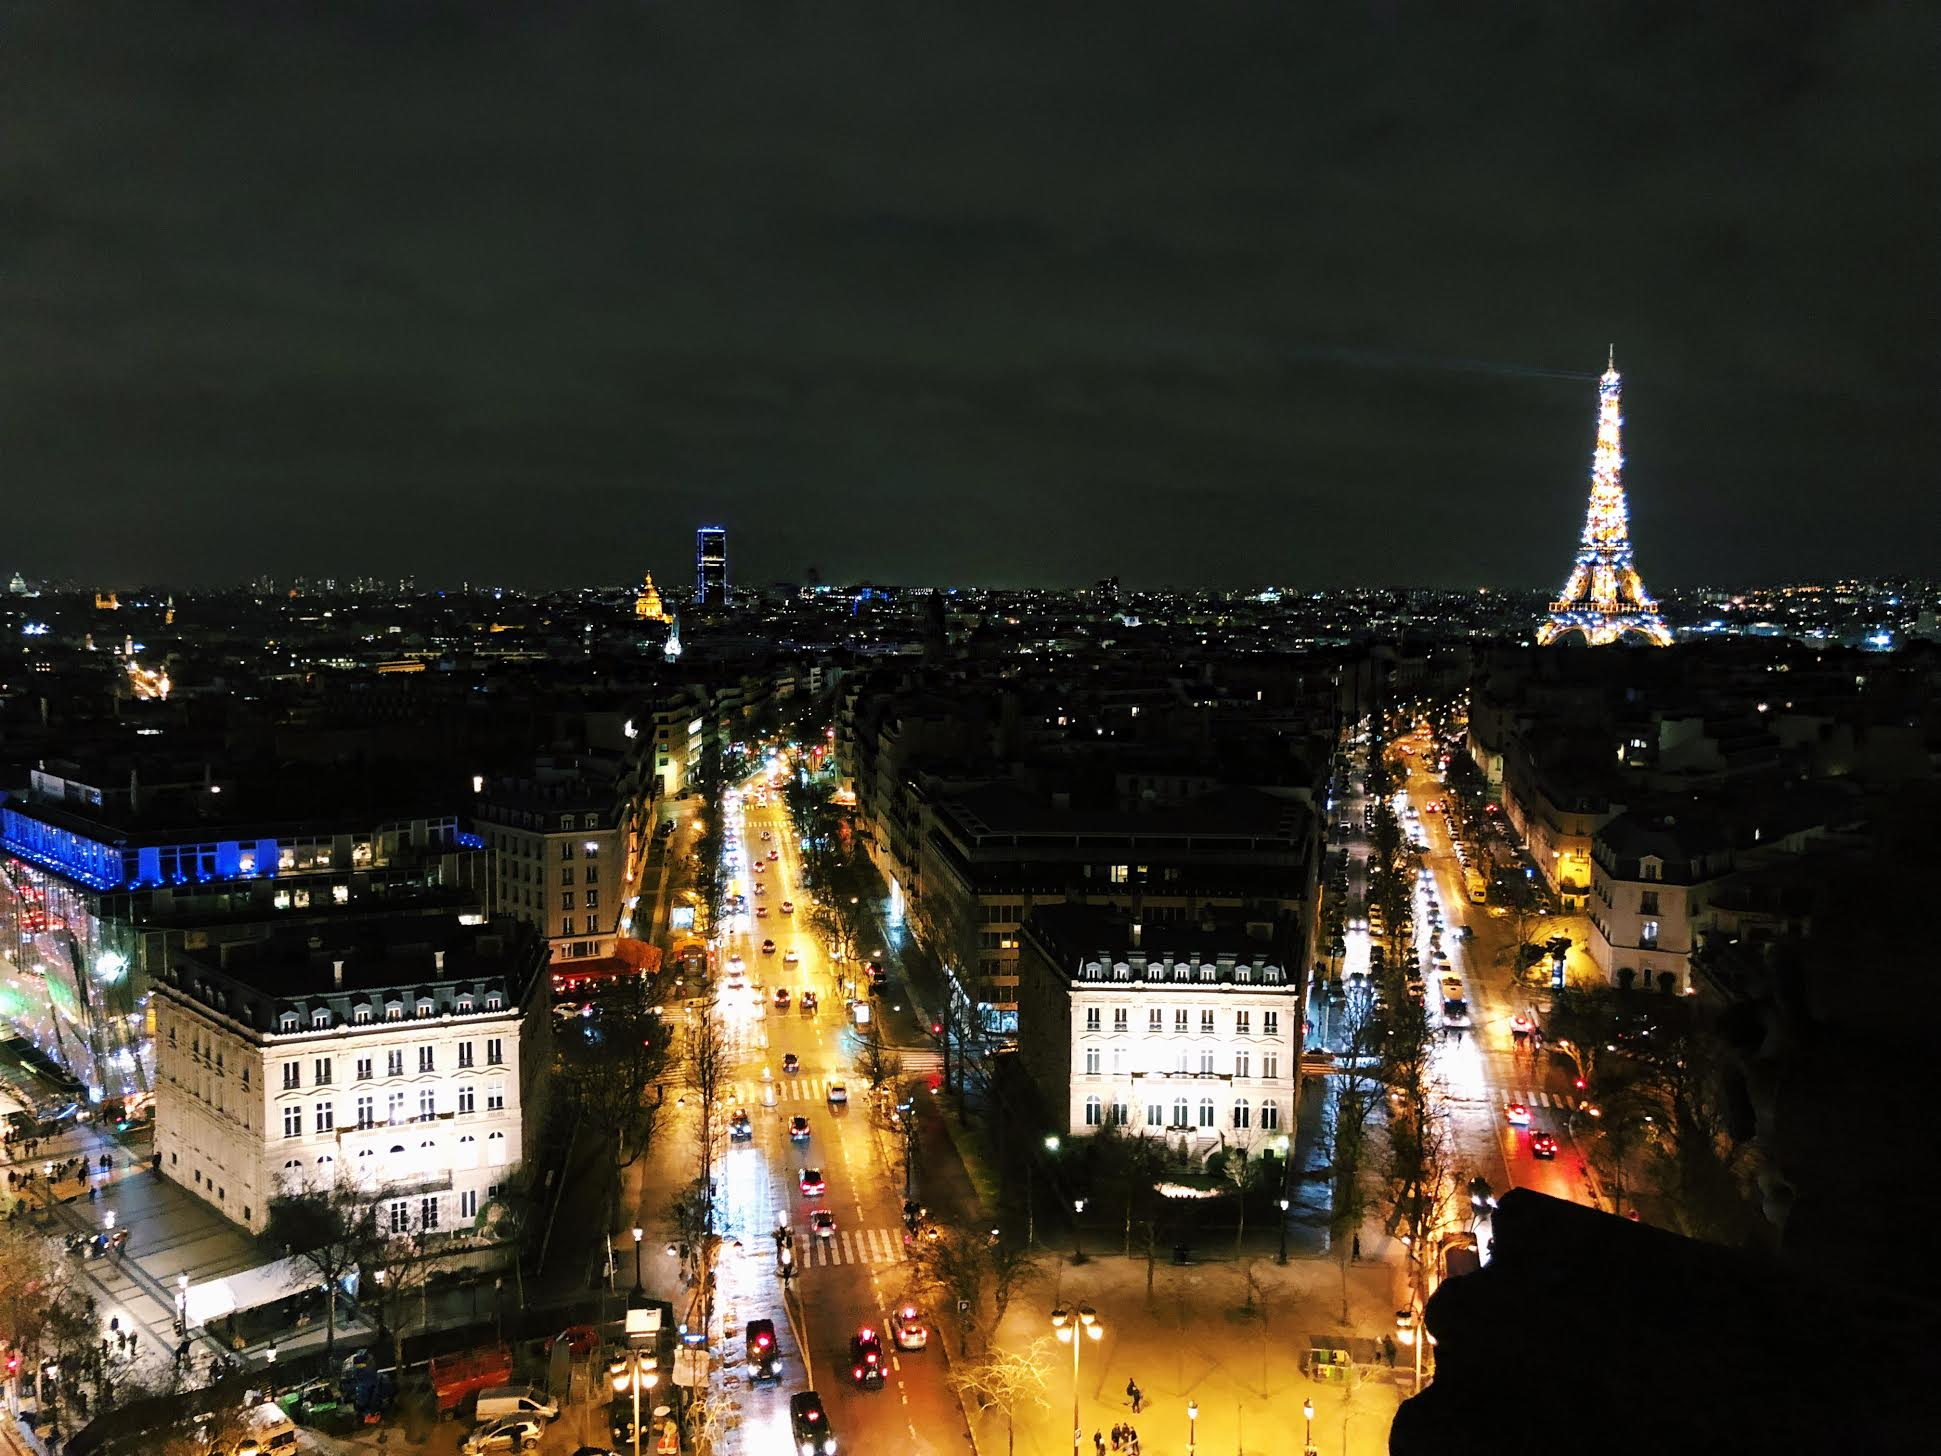 Muslim-travel-guide-Paris-Eiffel-Tower-light-show.jpg